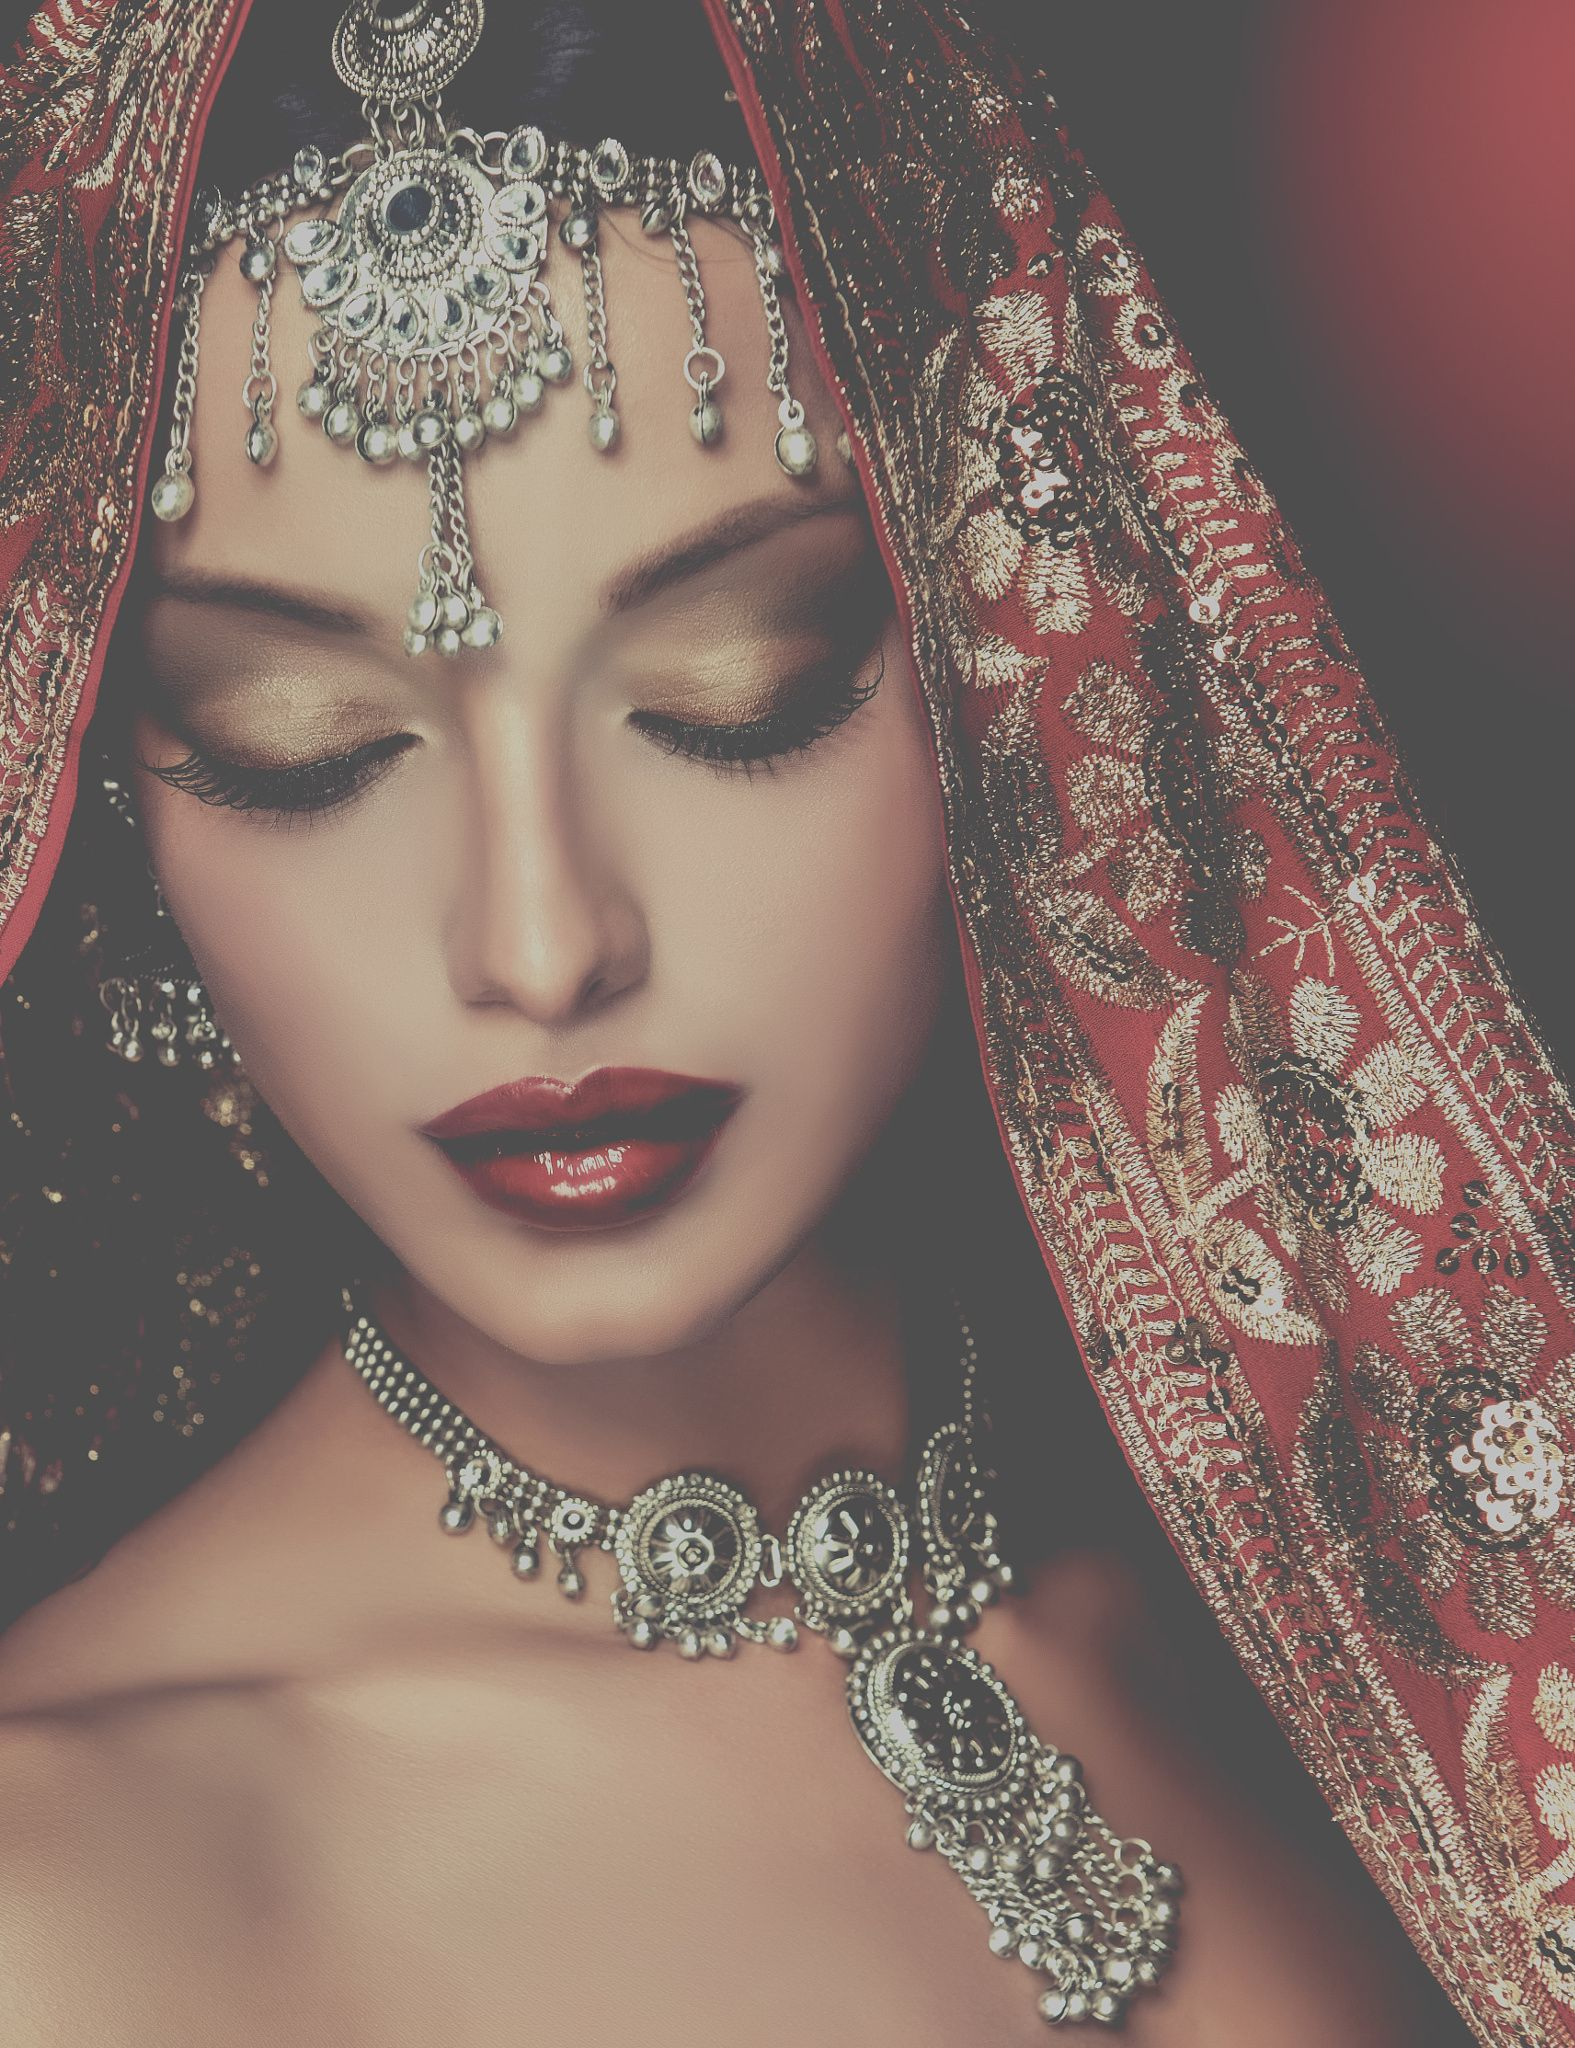 Beautiful Indian women portrait with jewelry elegant Indian gir